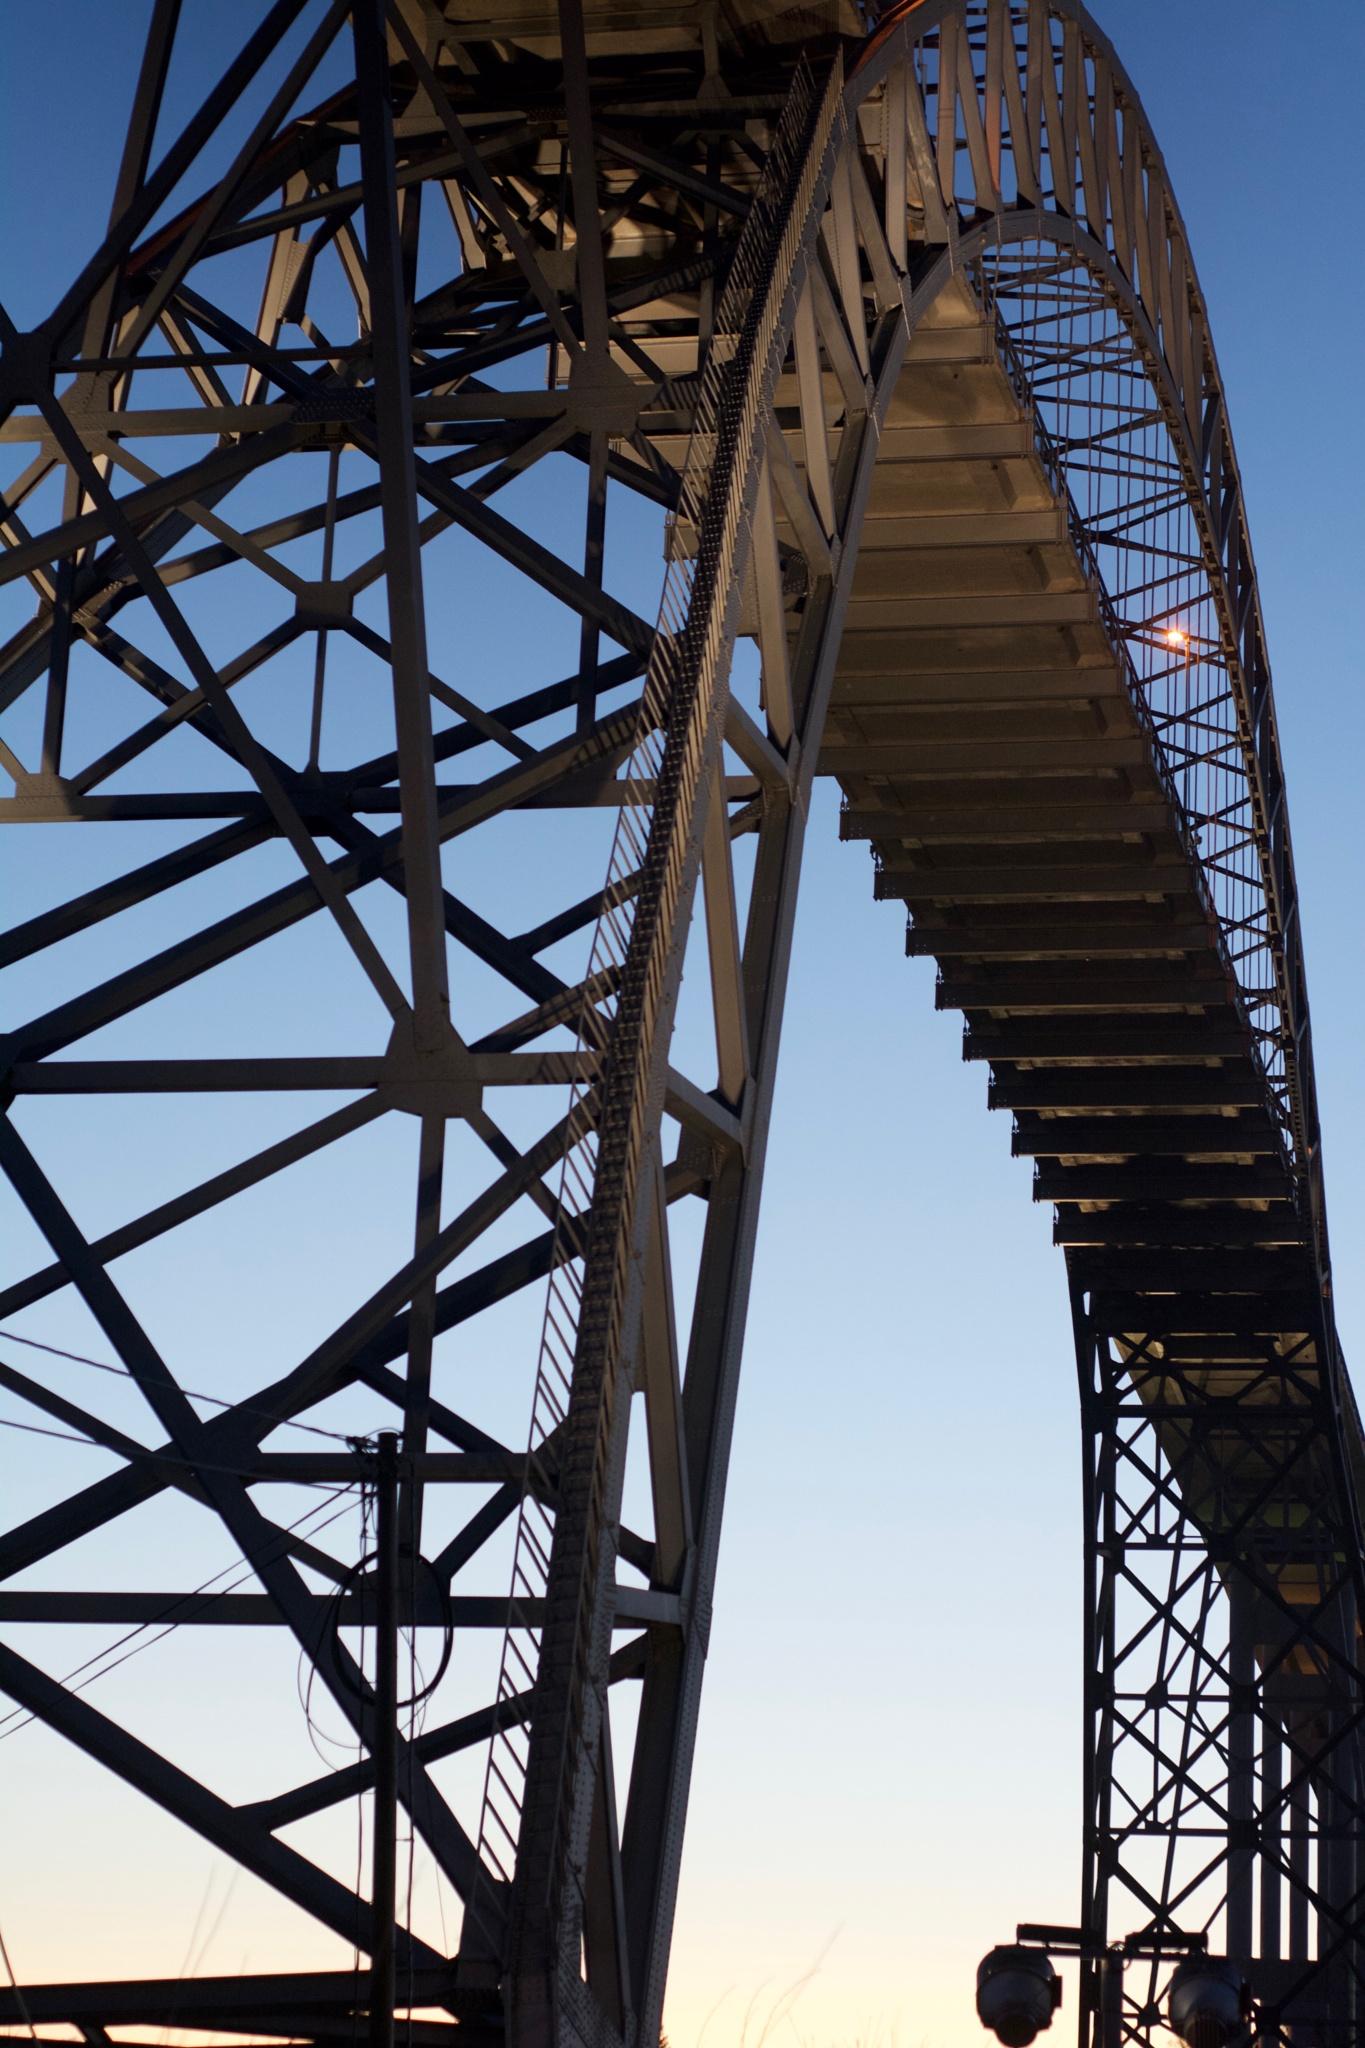 Karmsund Bridge from below by Lars-Toralf Utnes Storstrand